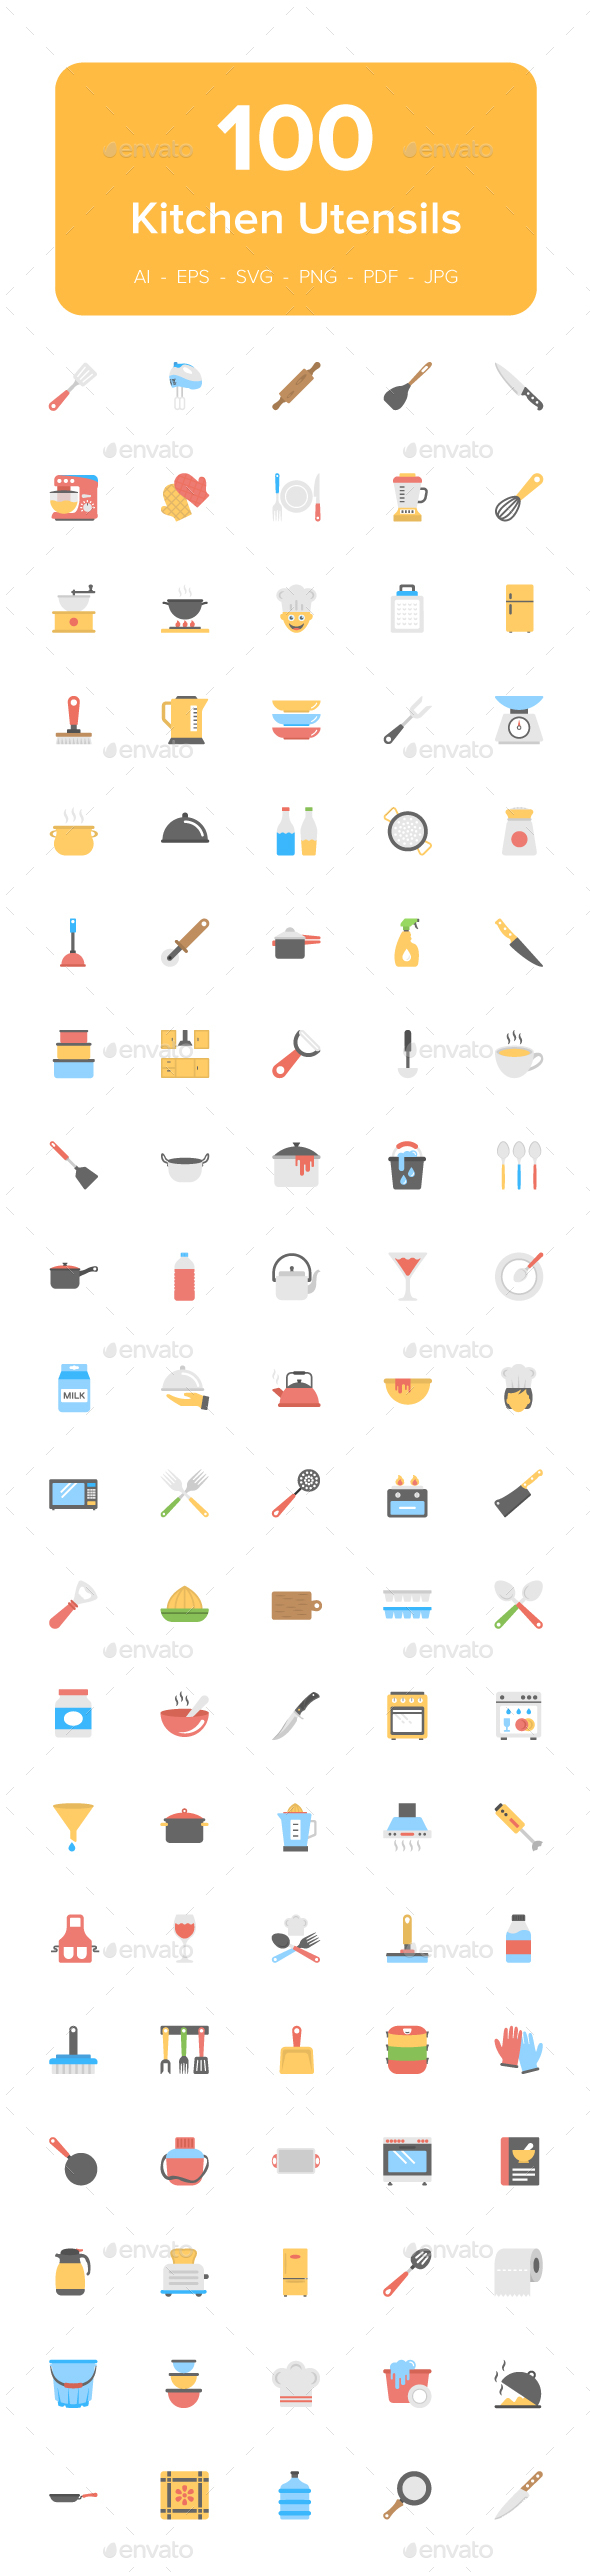 100 Kitchen Utensils Flat Icons - Icons